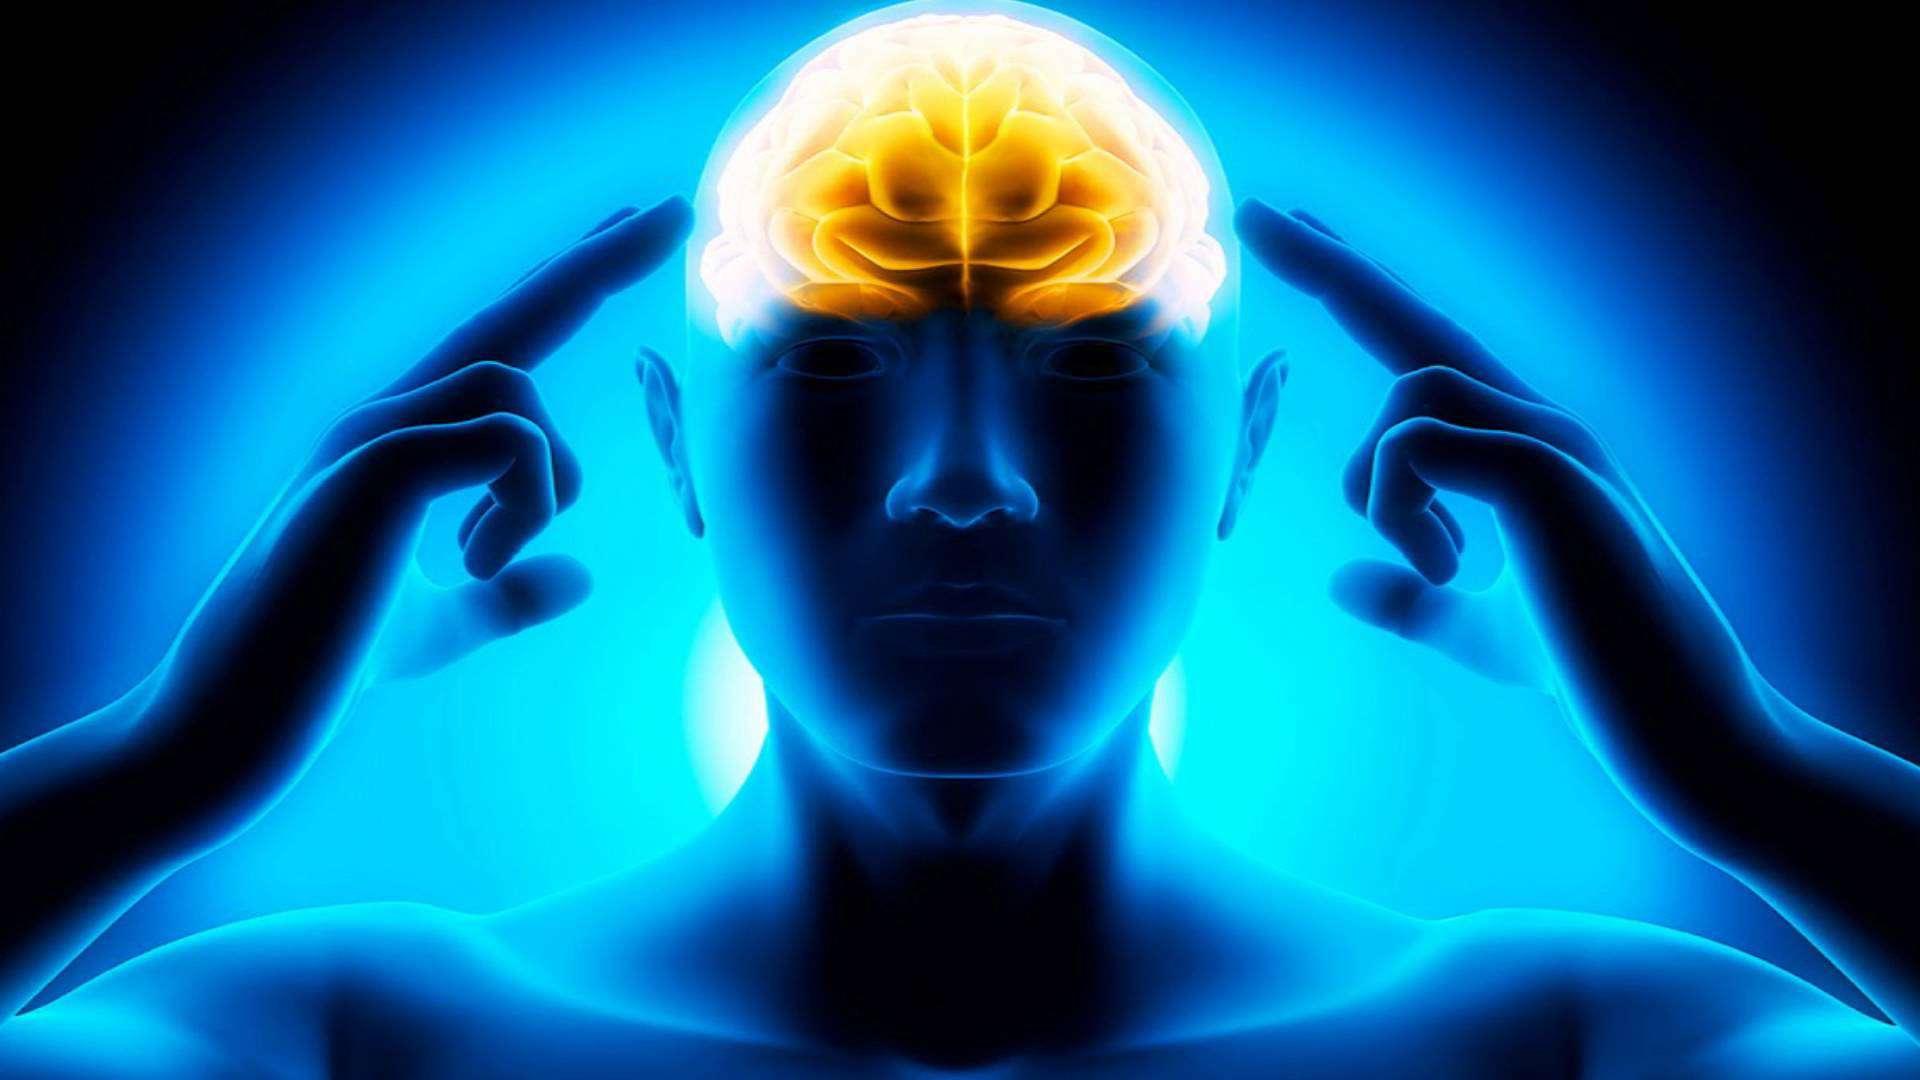 20171006 willyhern39164 id133303 maxresdefault - ¿Deseas aumentar tu Poder Mental? Repite en tu Mente la Poderosa Frase que voy a enseñarte - hermandadblanca.org